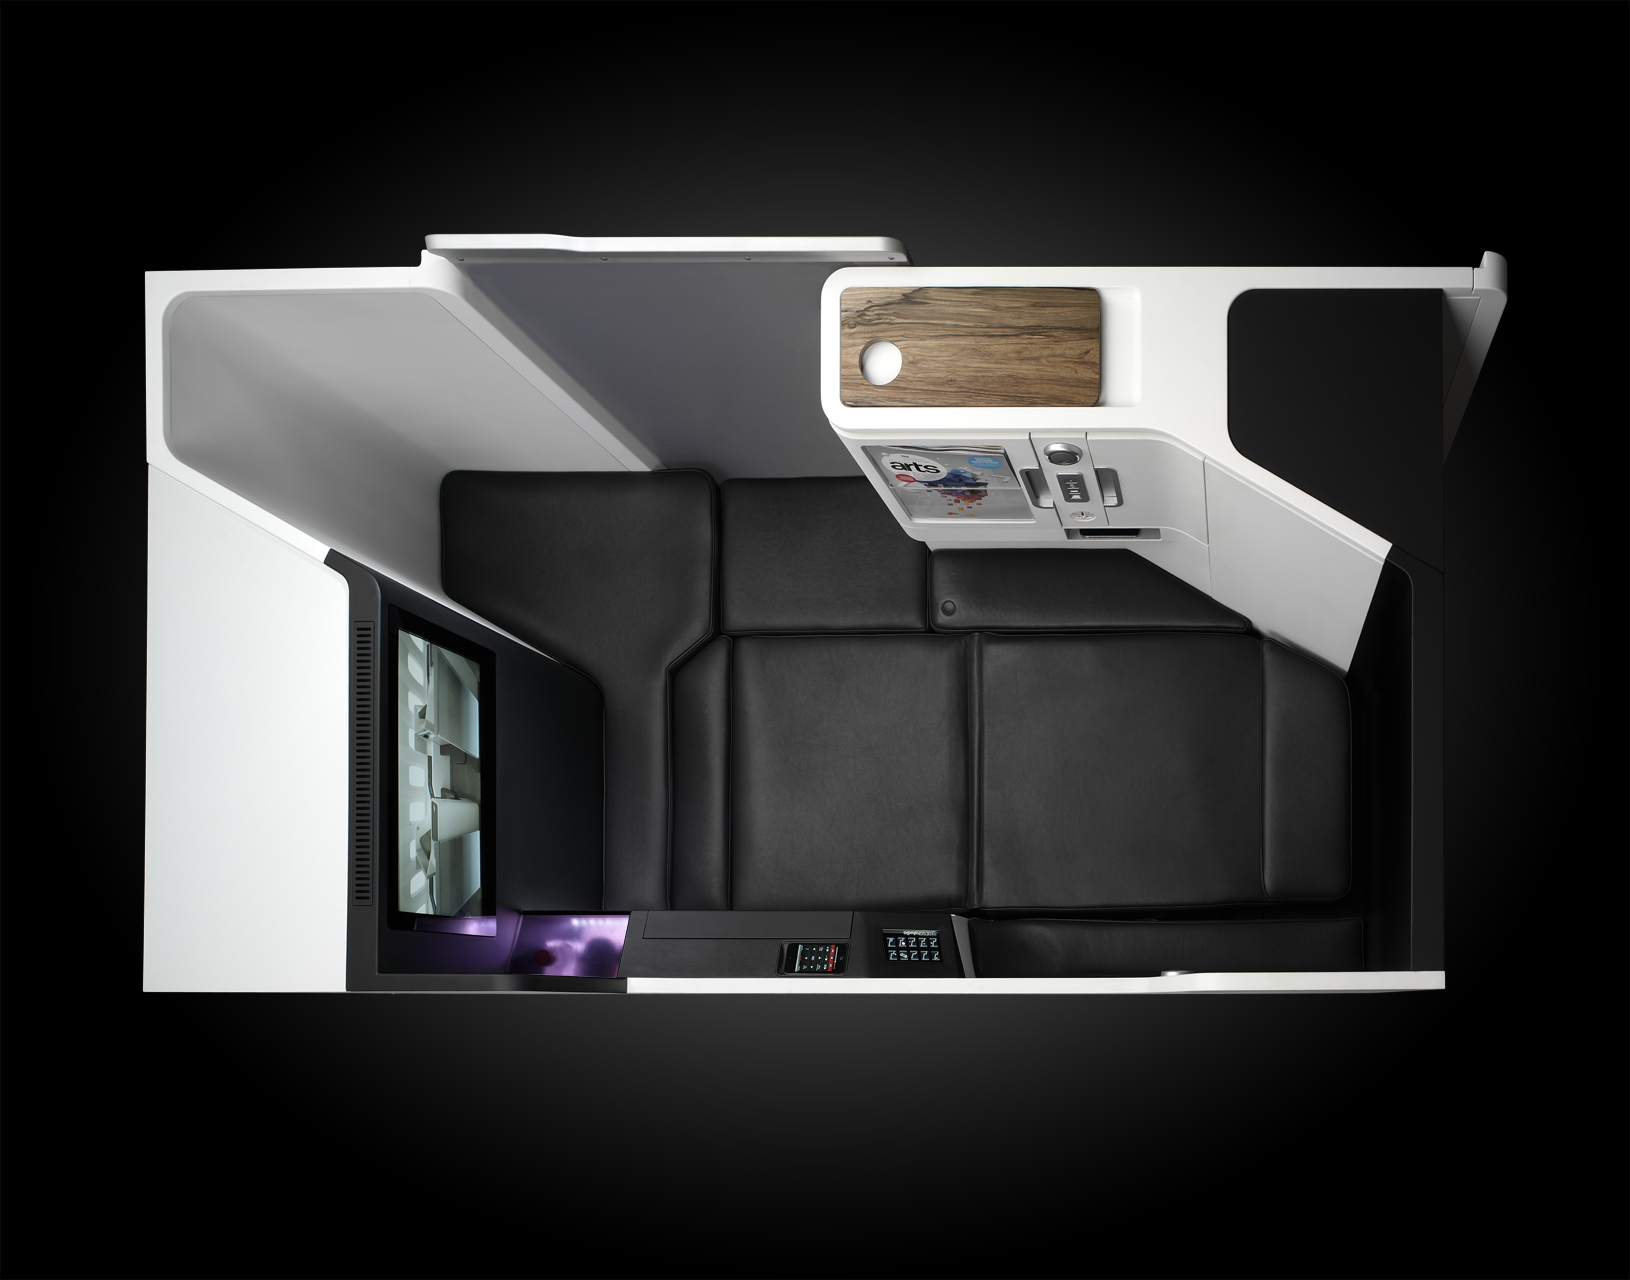 BA50 – Cabin interior